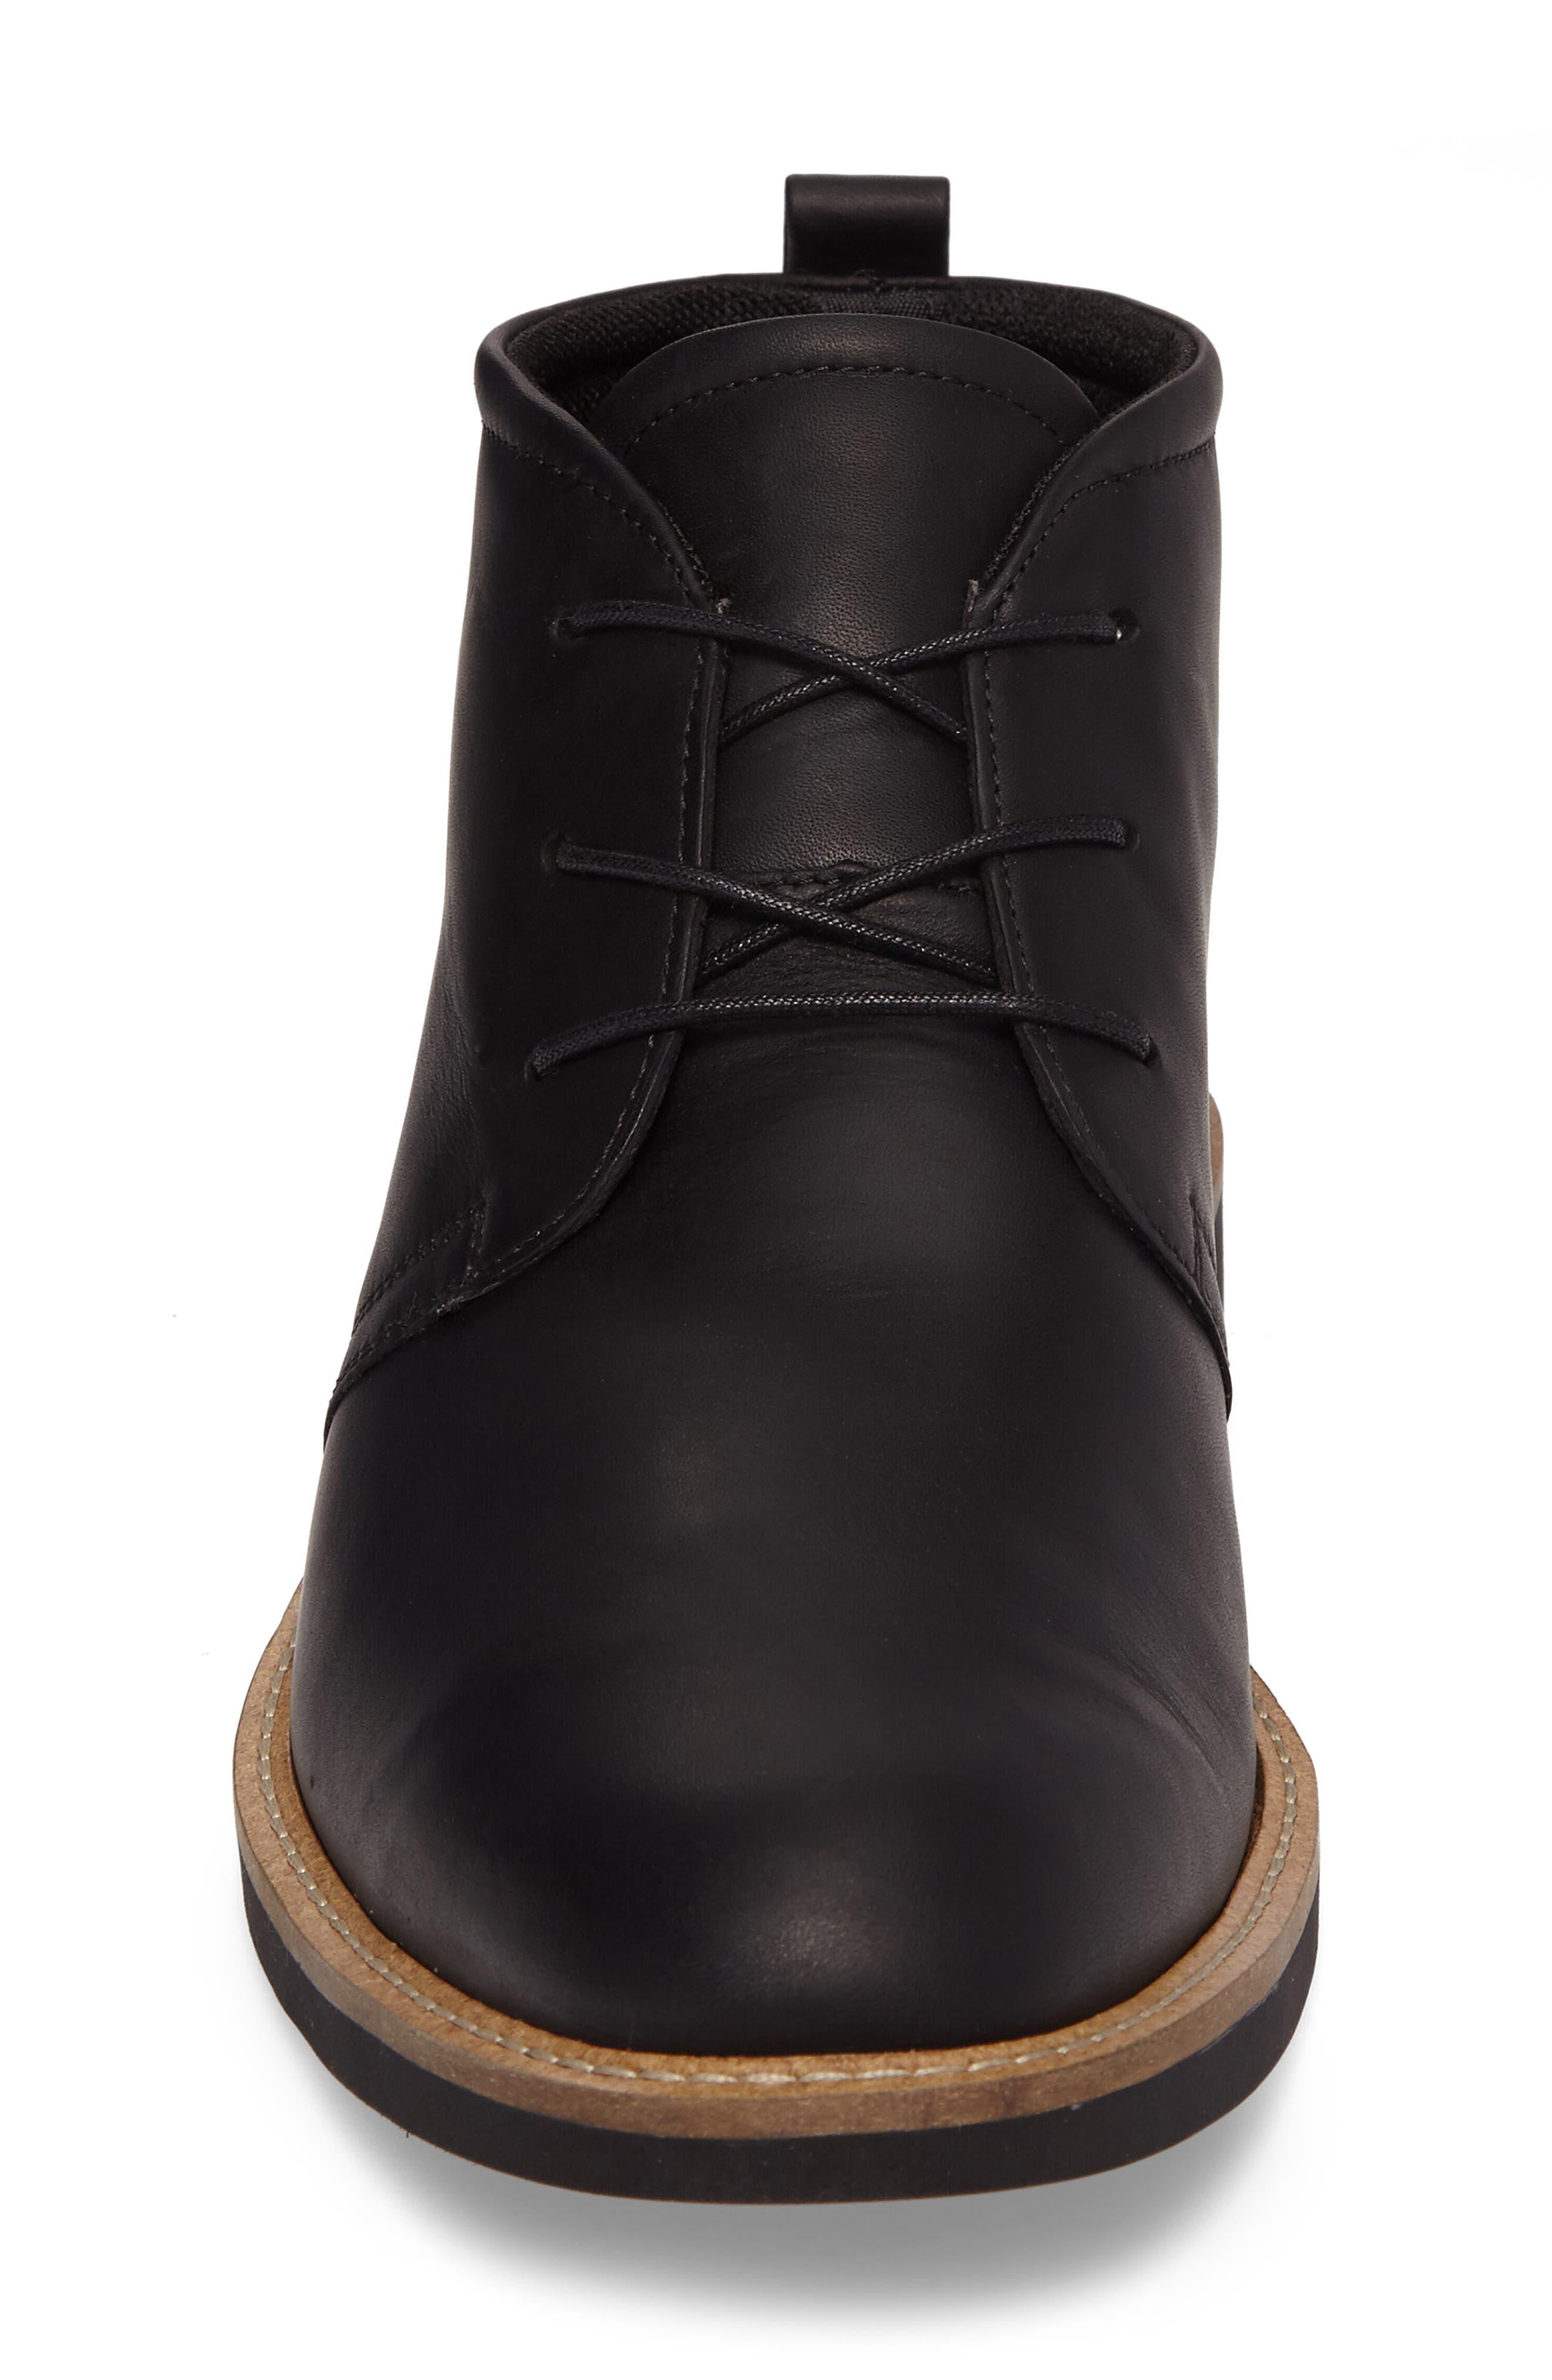 Biarritz Chukka Boot,                             Alternate thumbnail 4, color,                             009